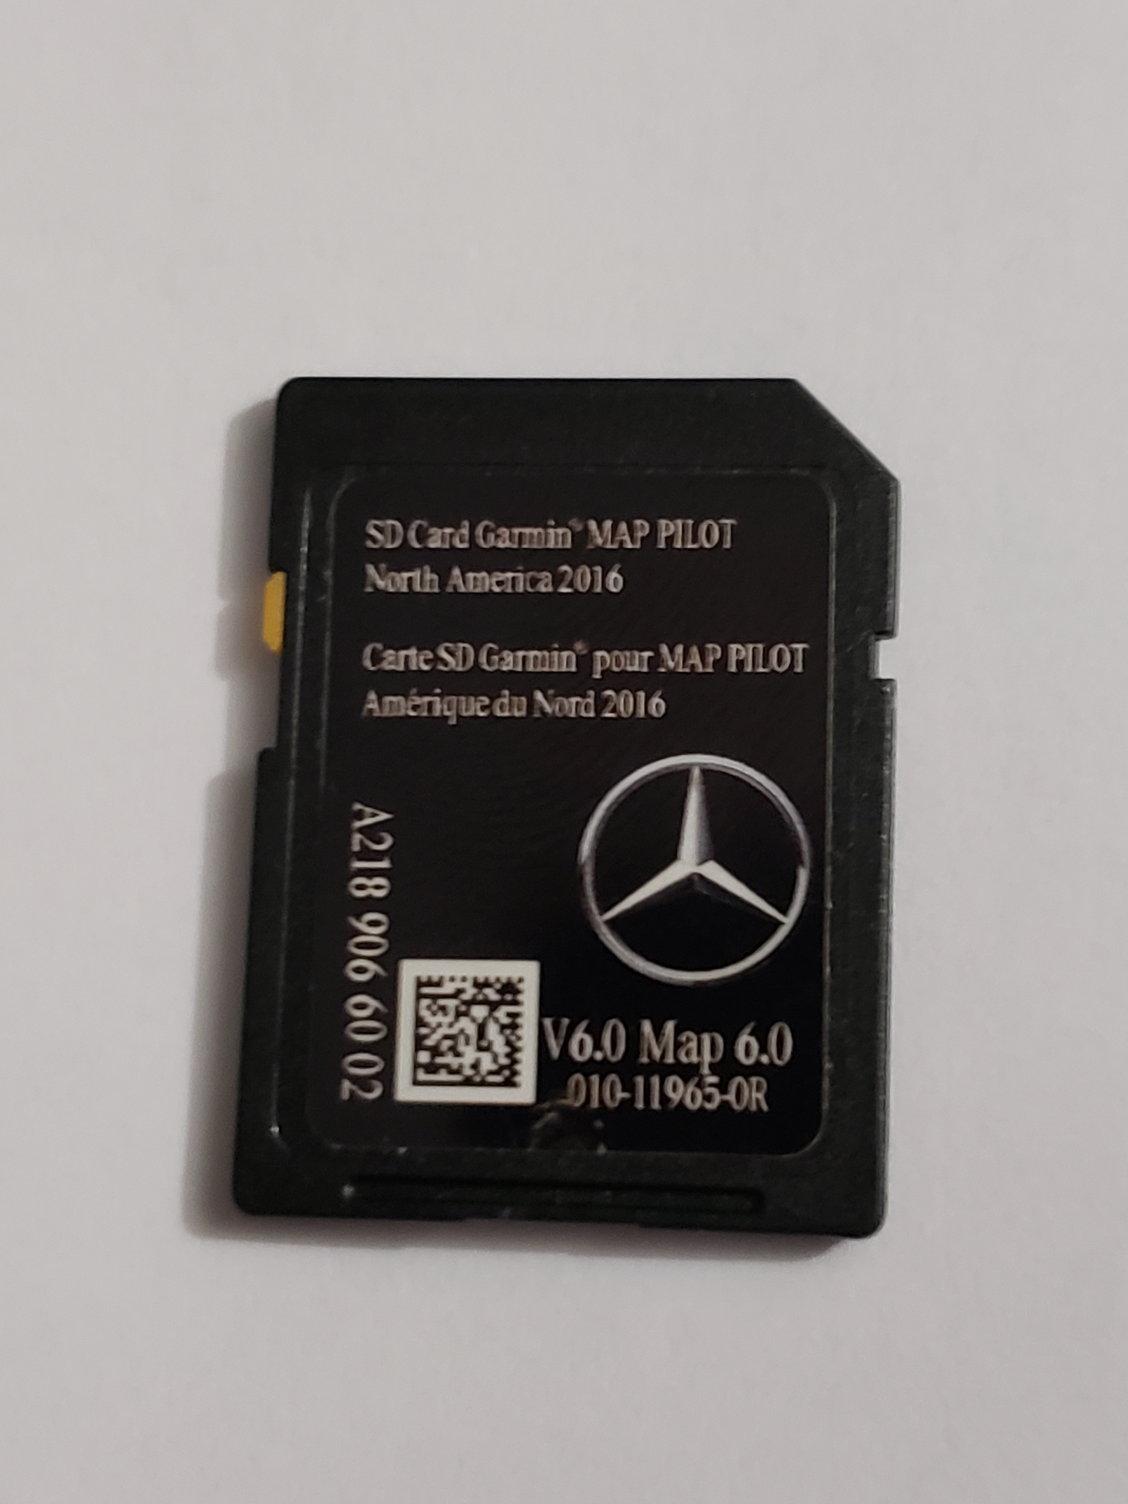 Garmin Map Pilot Sd Card Hack